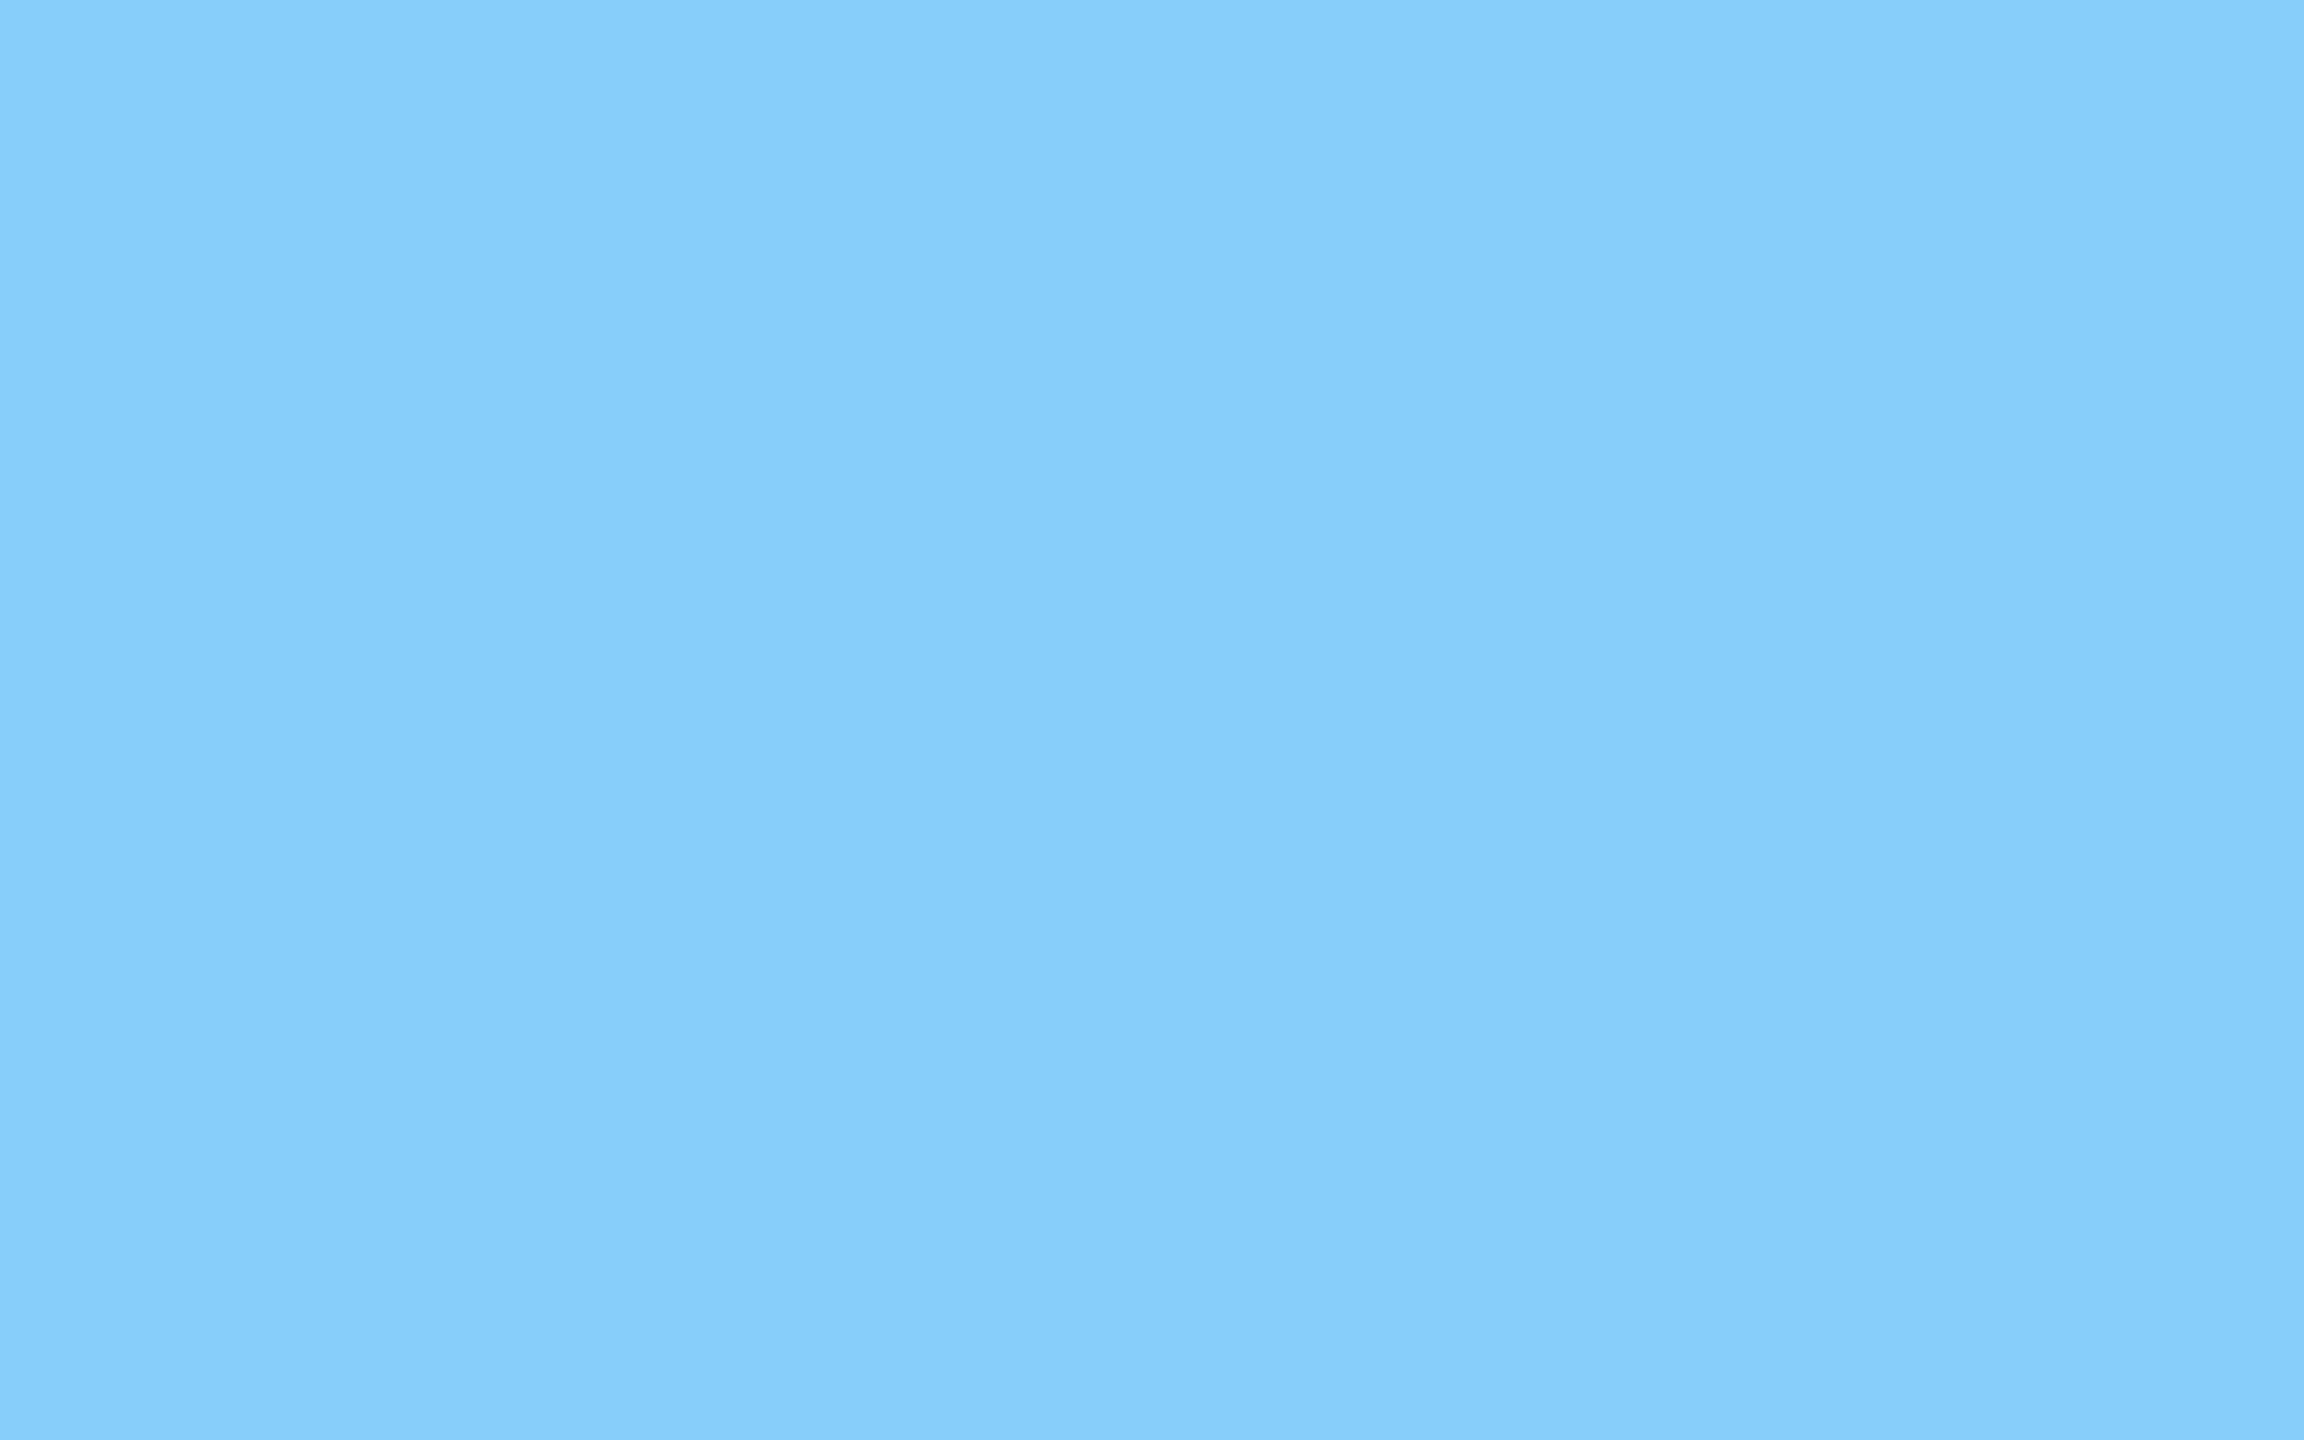 2304x1440 Light Sky Blue Solid Color Background